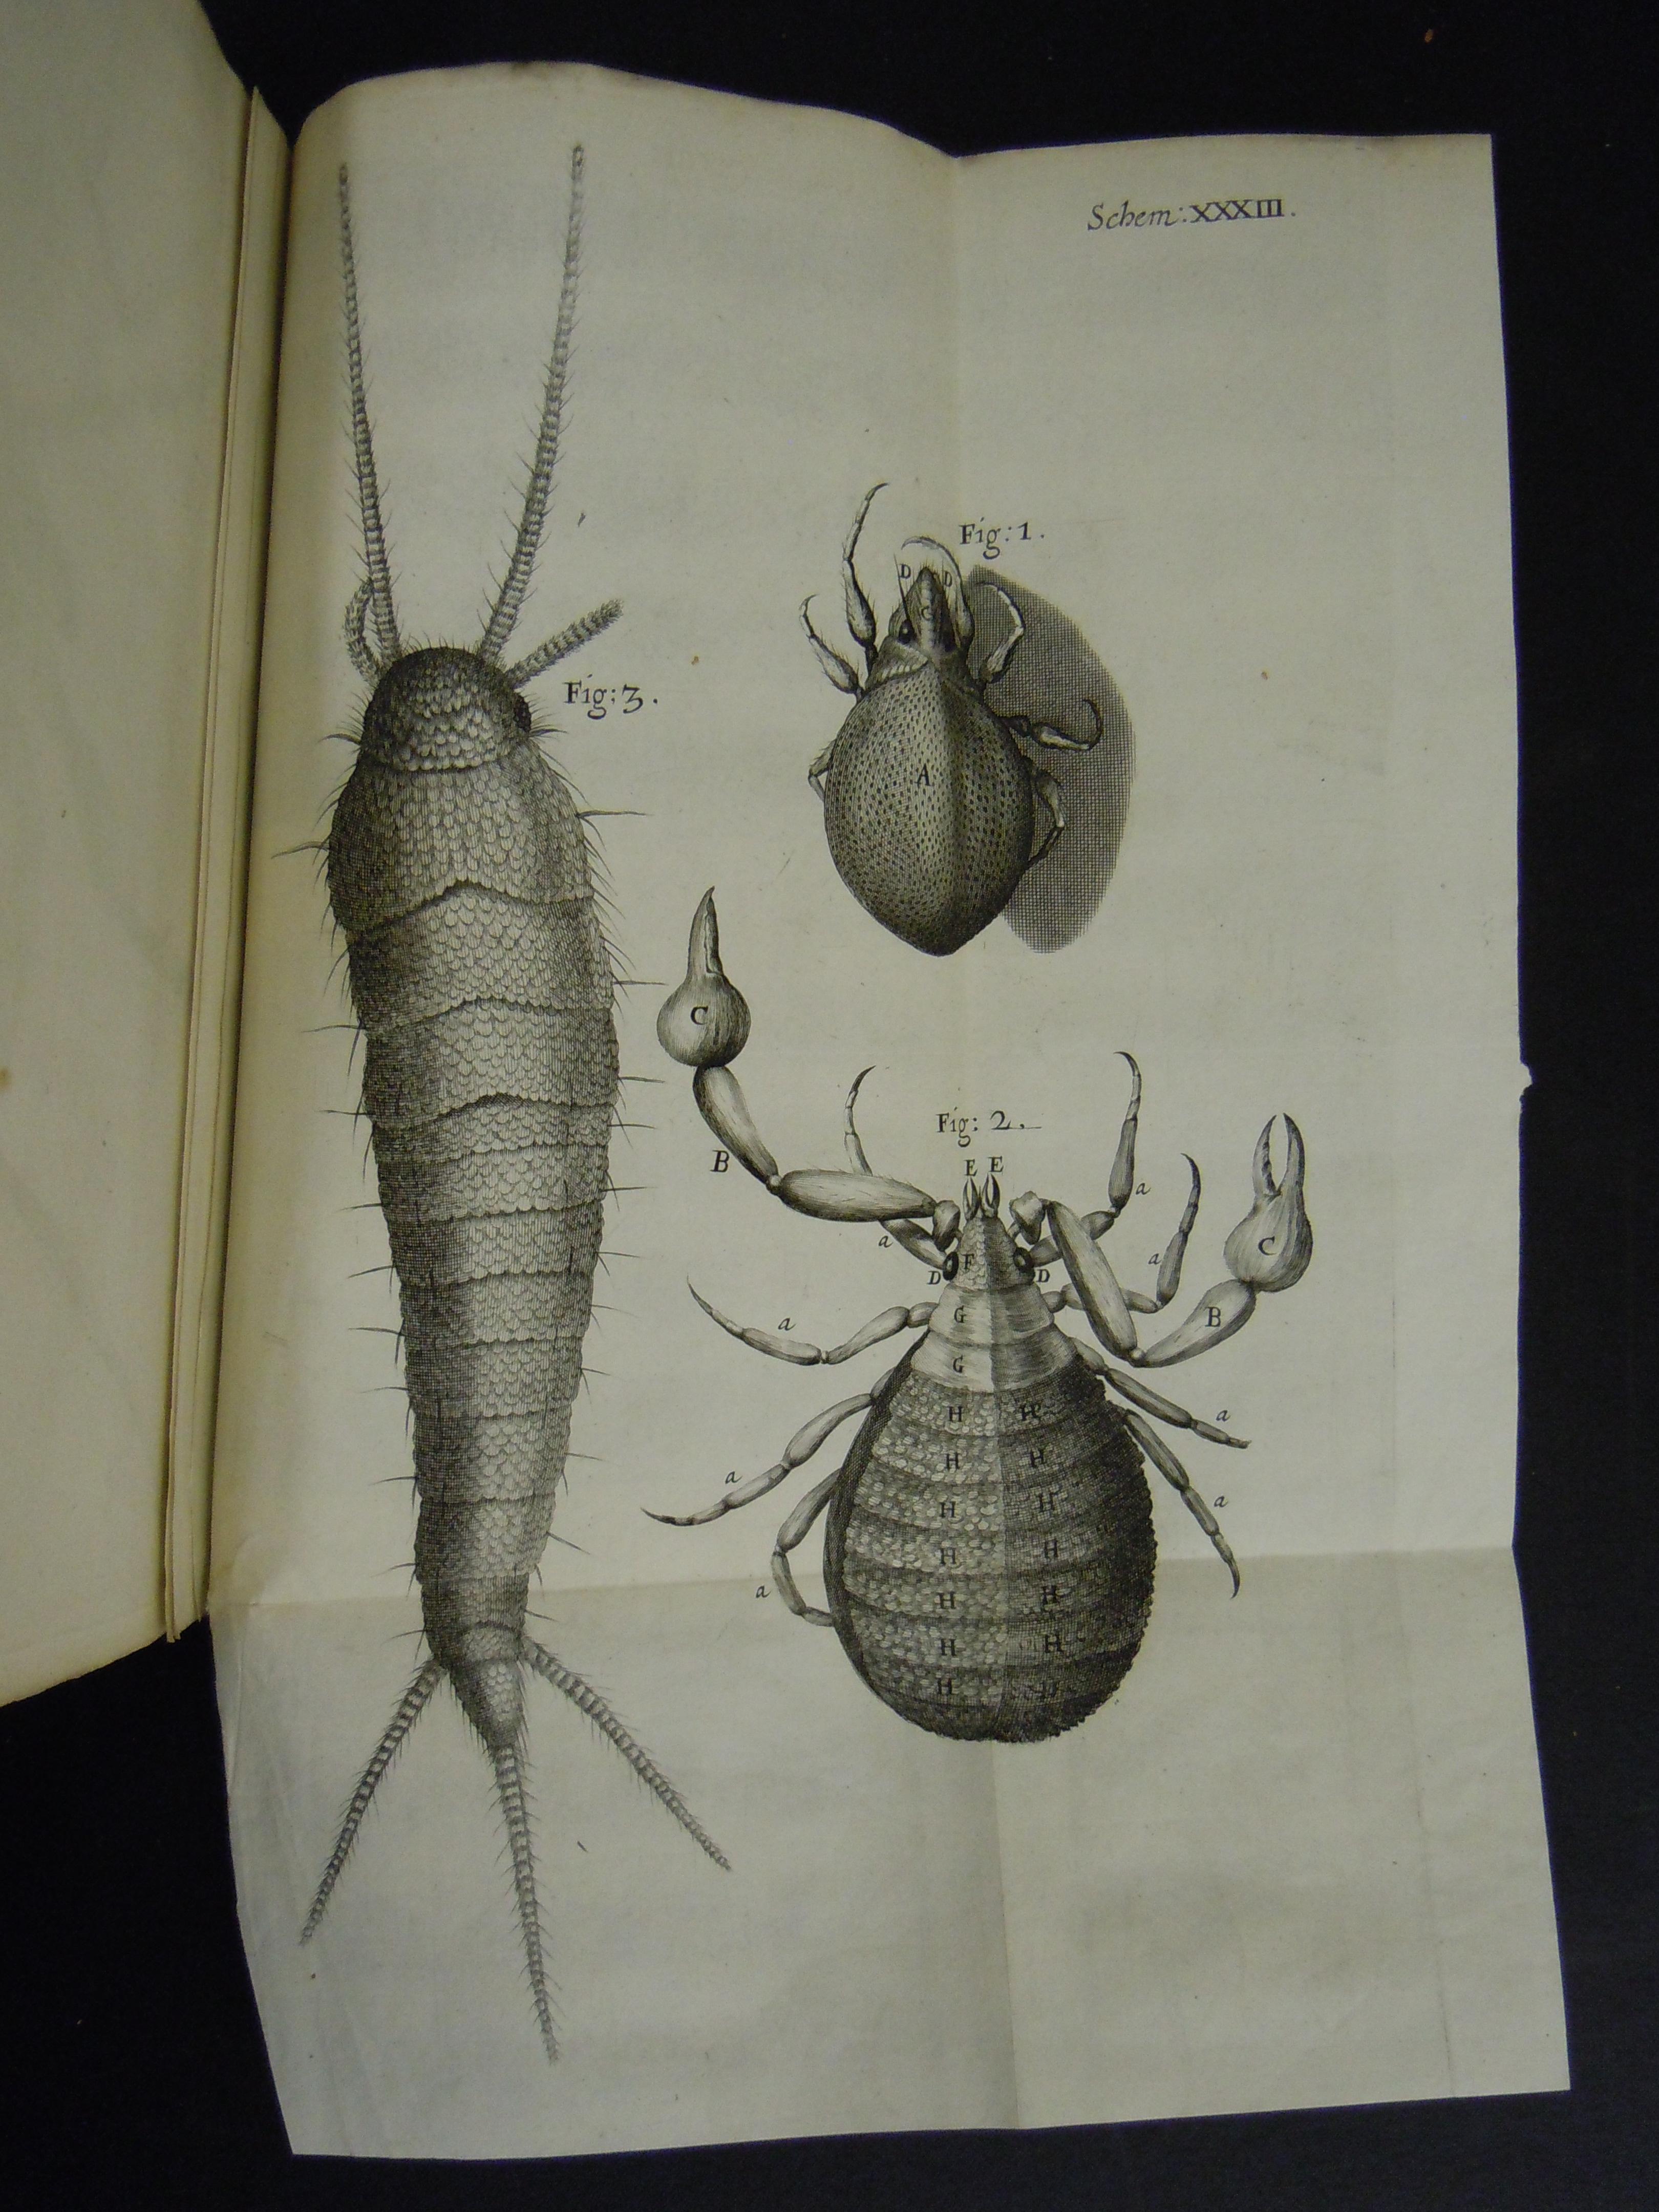 BT1.31.14, pl. xxxiii, Robert Hooke's Micrographia, 1665